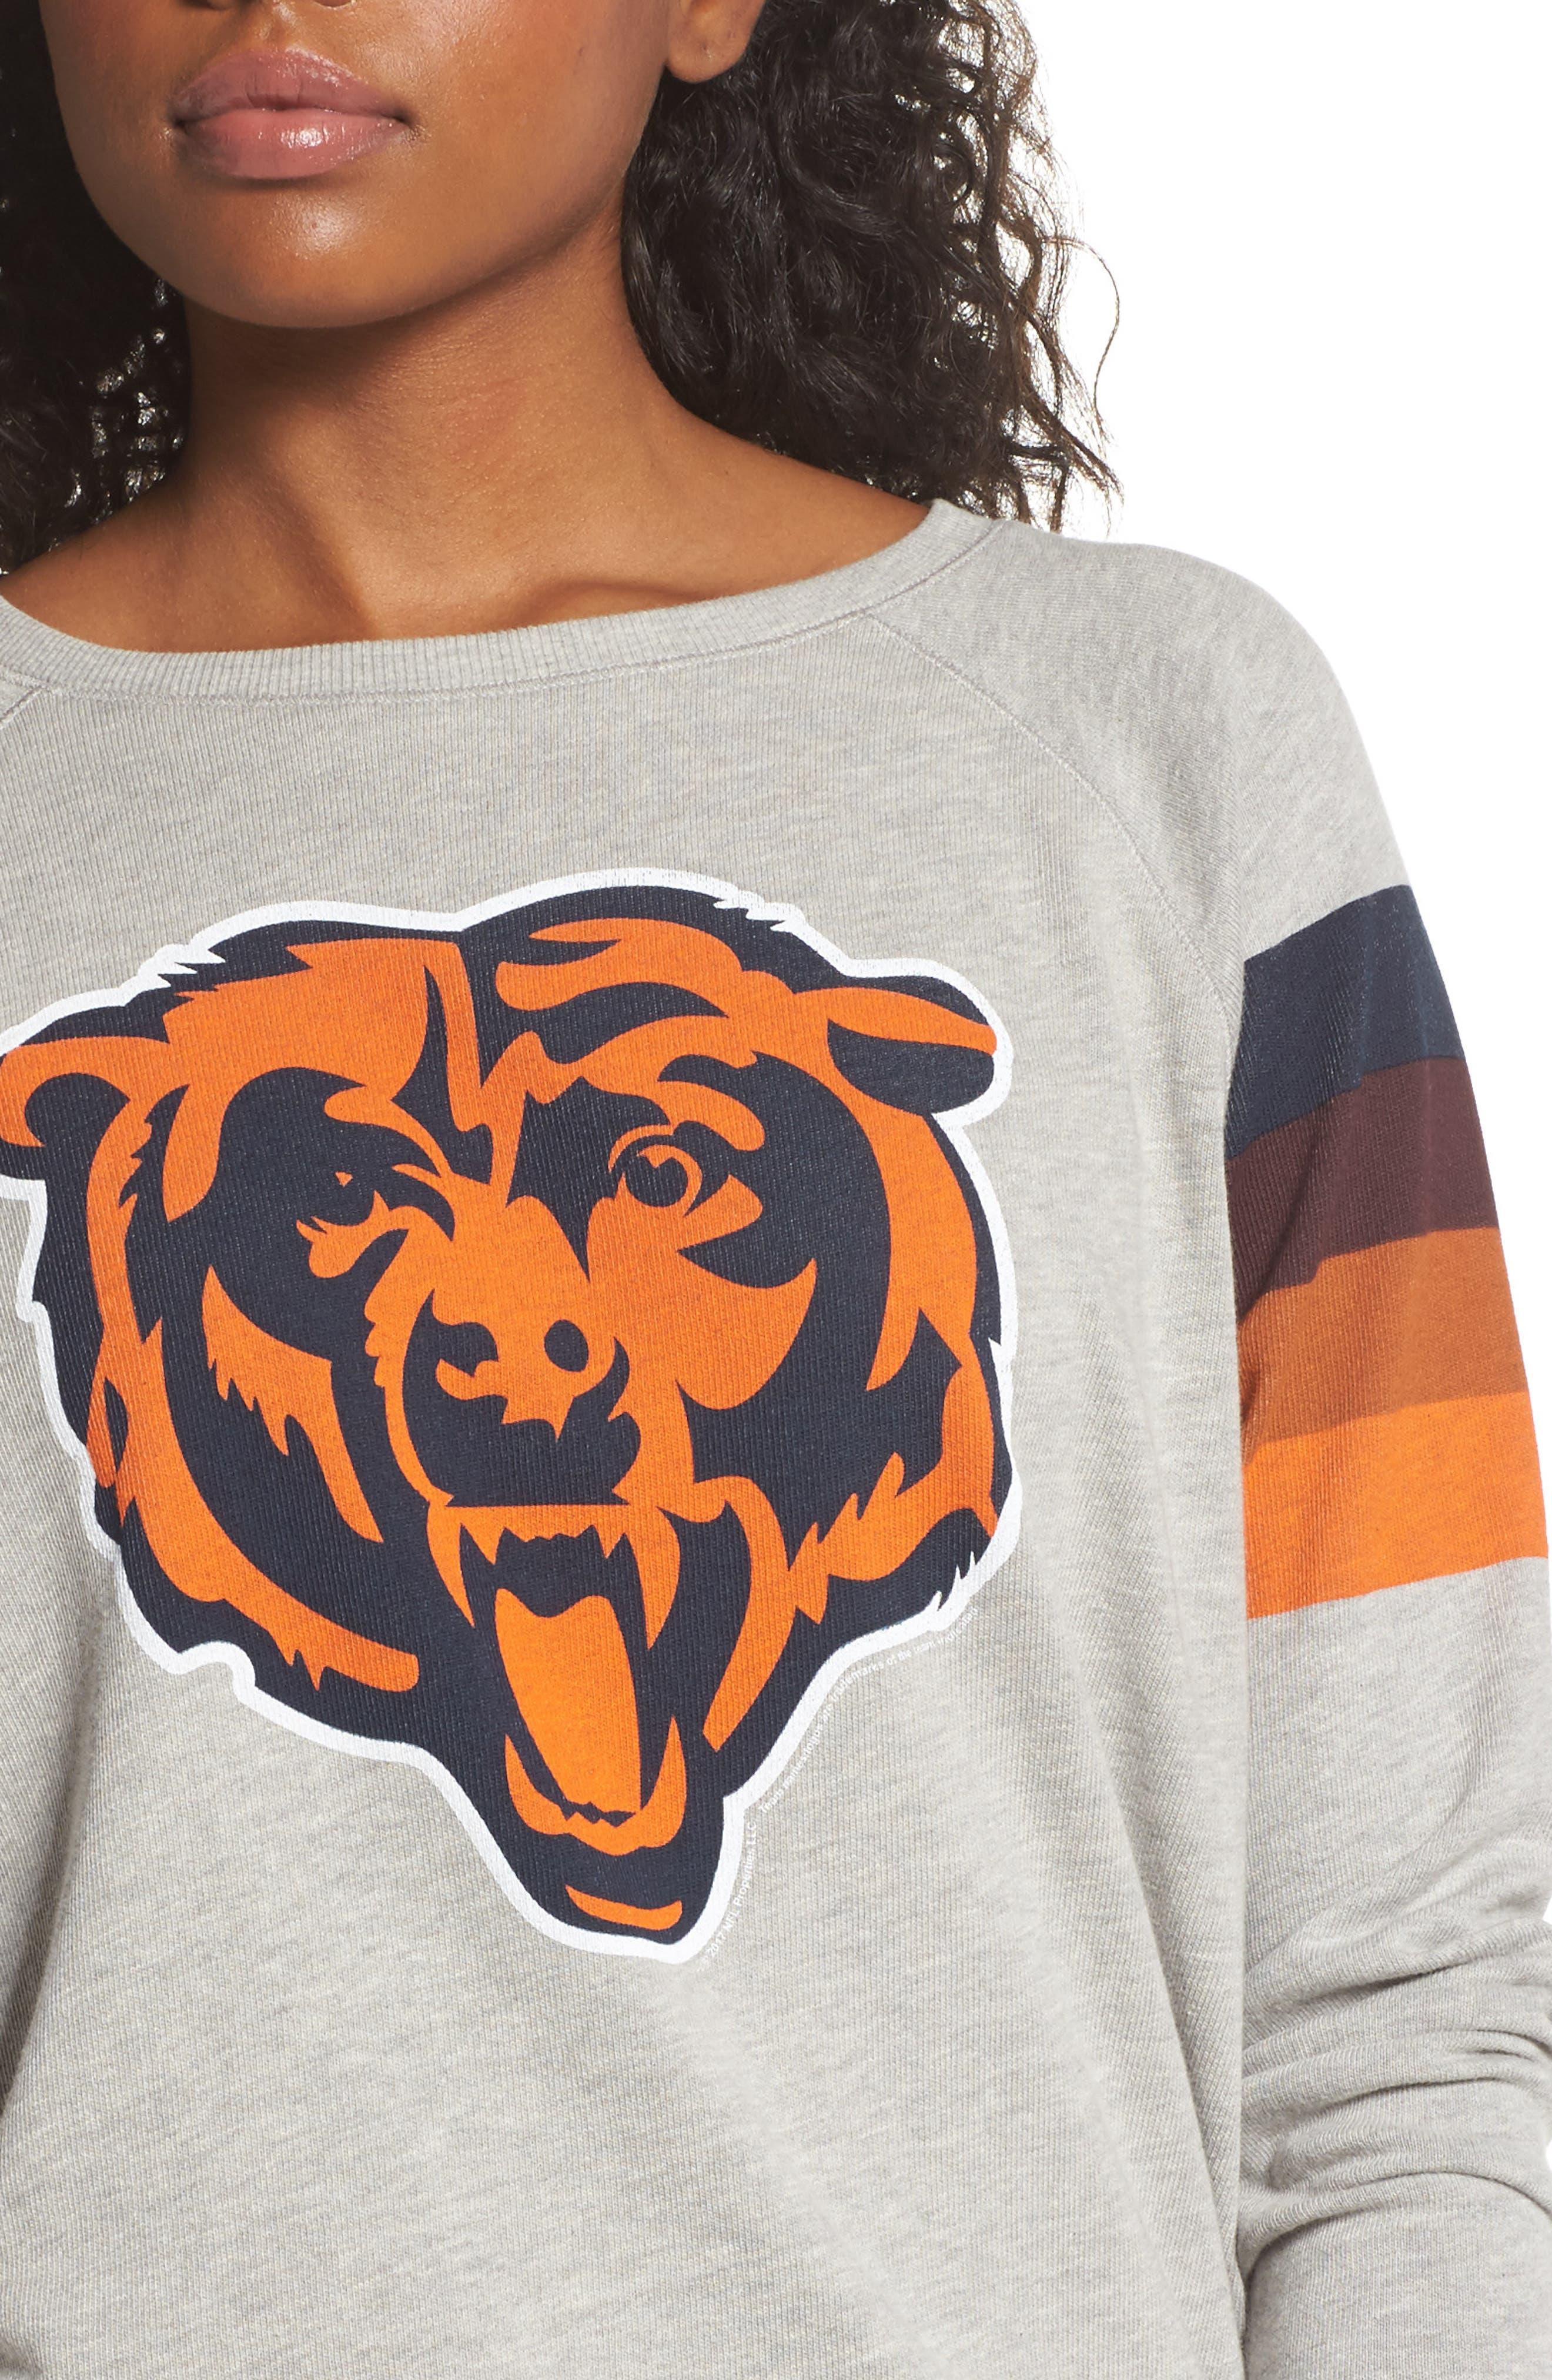 NFL Chicago Bears Hacci Sweatshirt,                             Alternate thumbnail 4, color,                             030